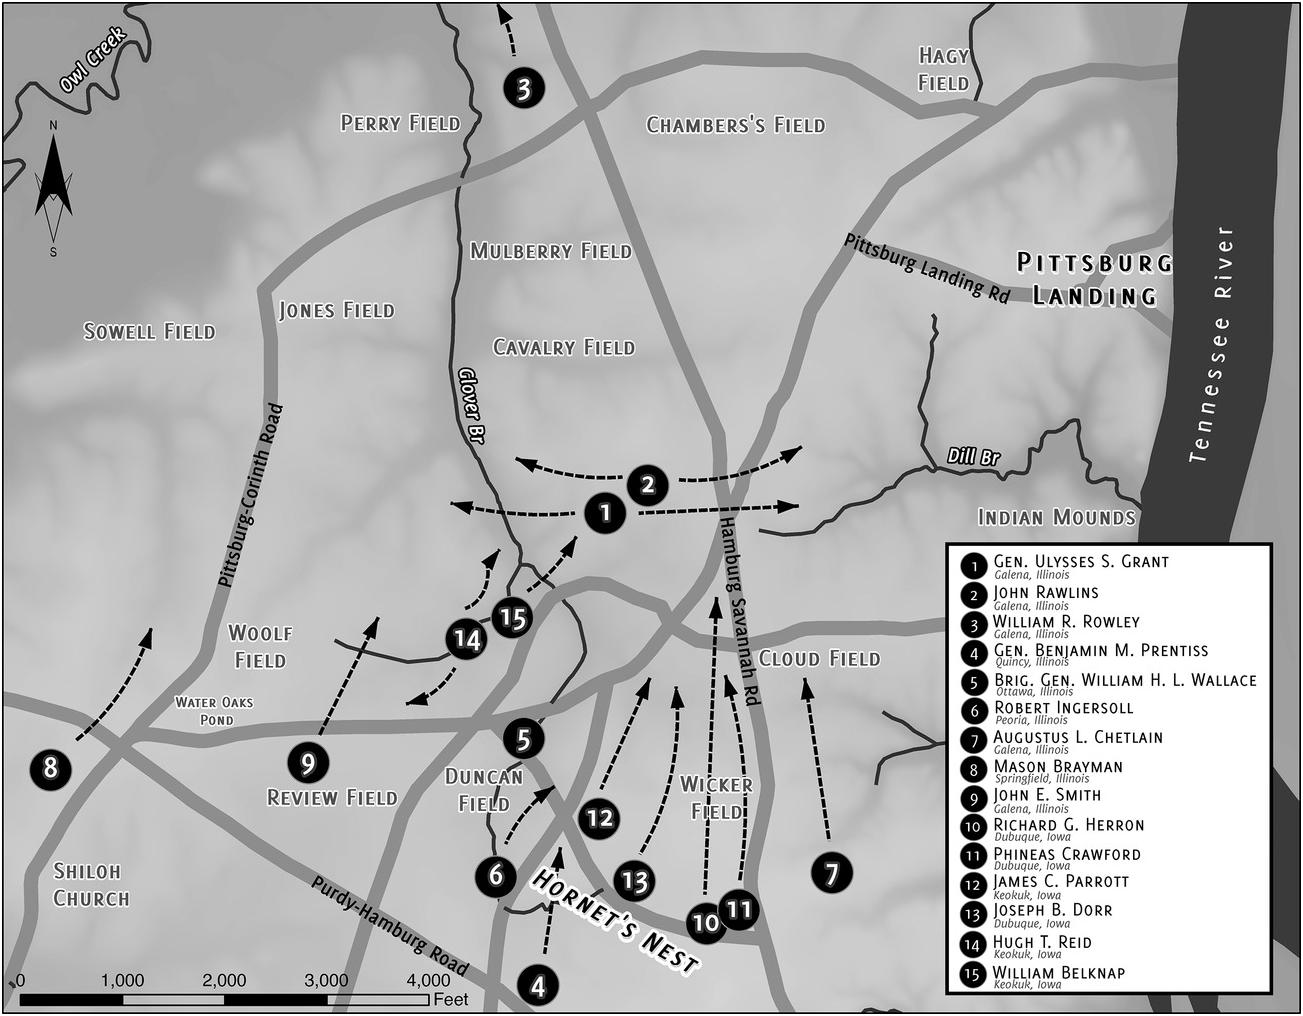 Battlefield (Part II) - From Hometown to Battlefield in the